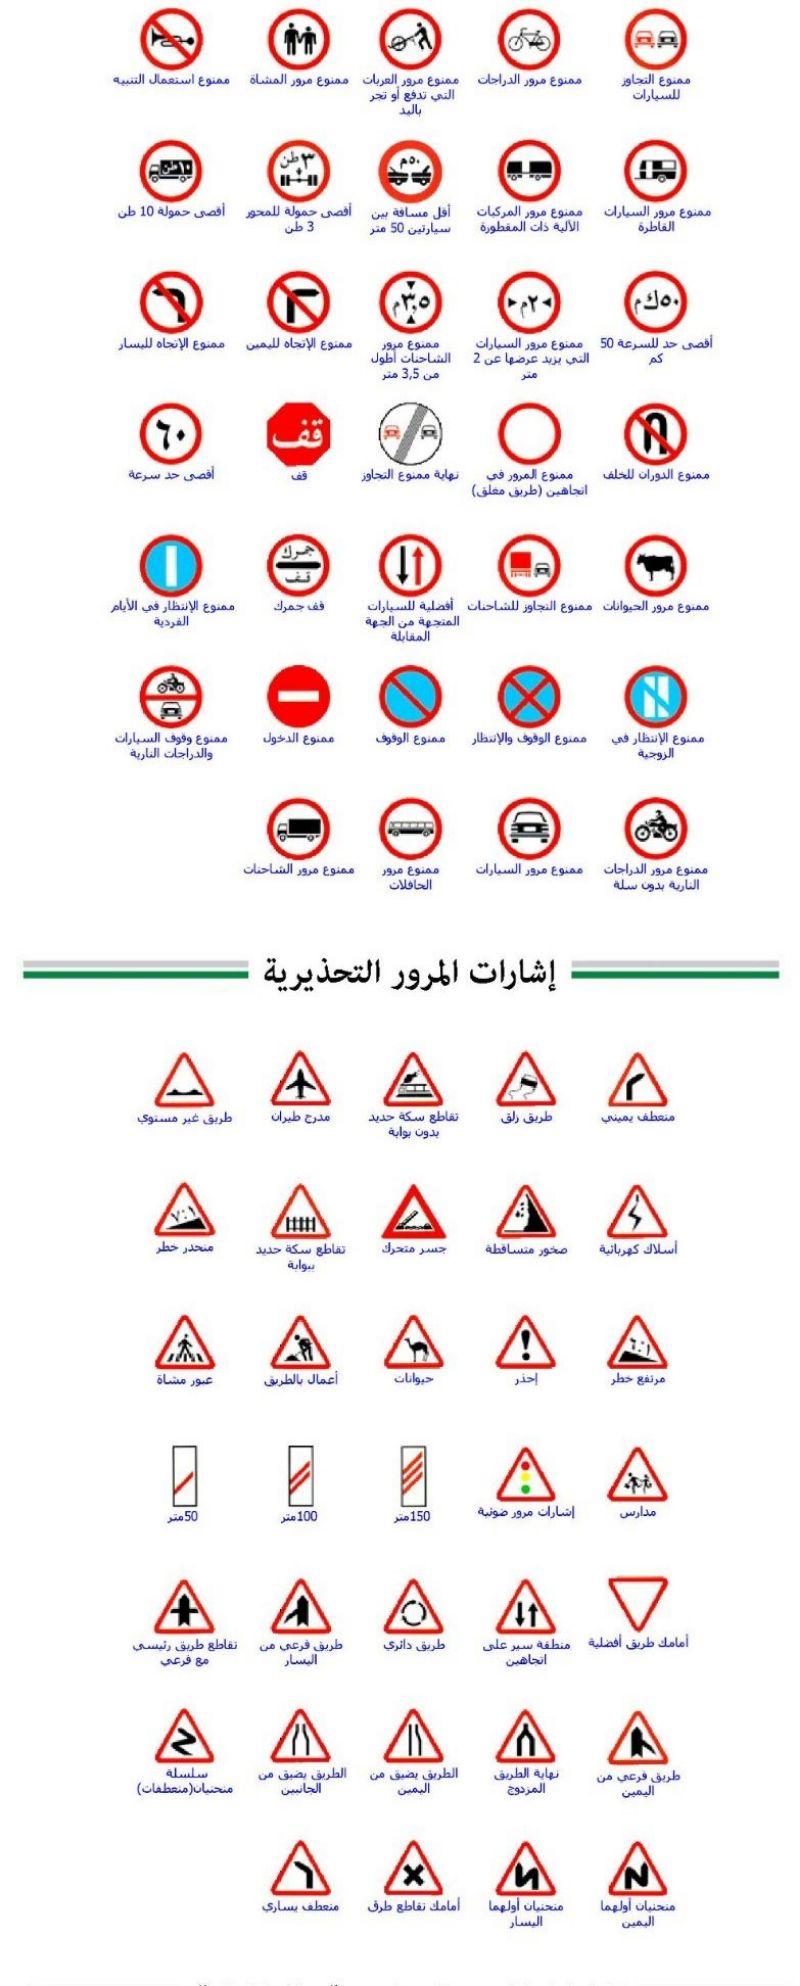 Striveme تعلمي اشارات المرور في السعودية